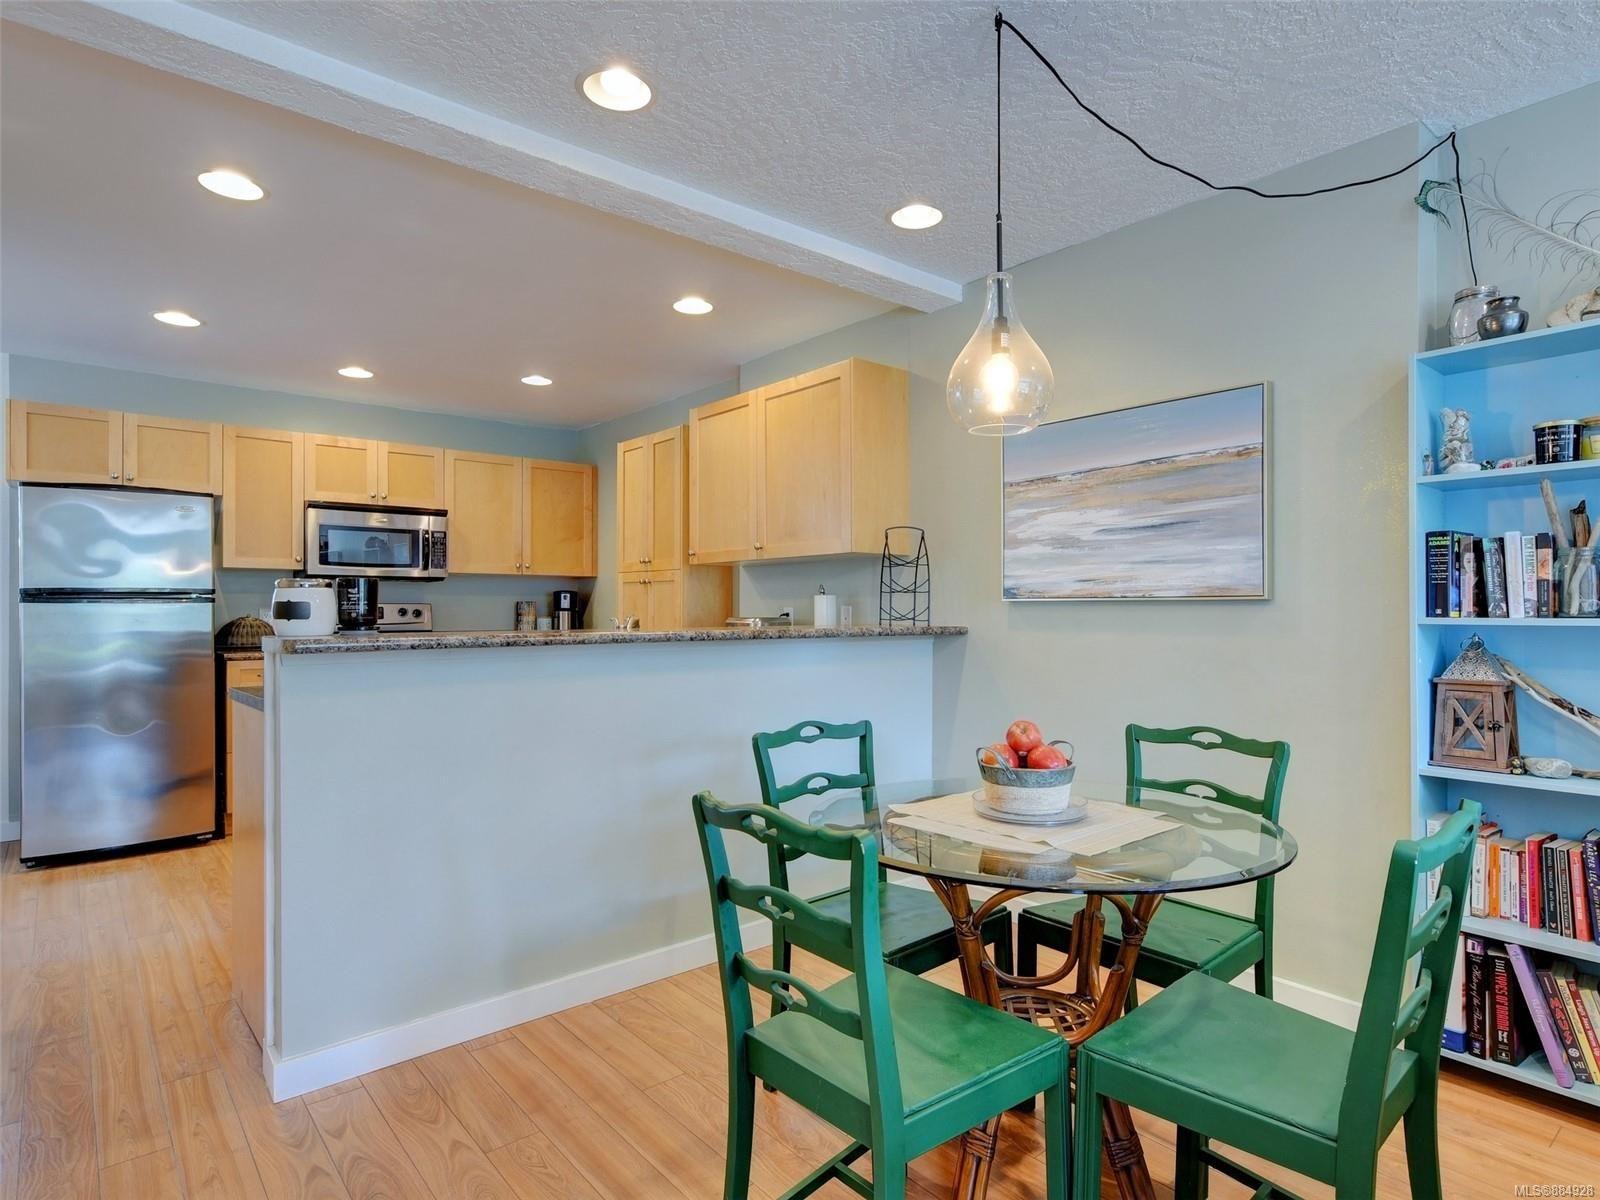 Photo 7: Photos: 6896 Beaton Rd in : Sk Broomhill Half Duplex for sale (Sooke)  : MLS®# 884928